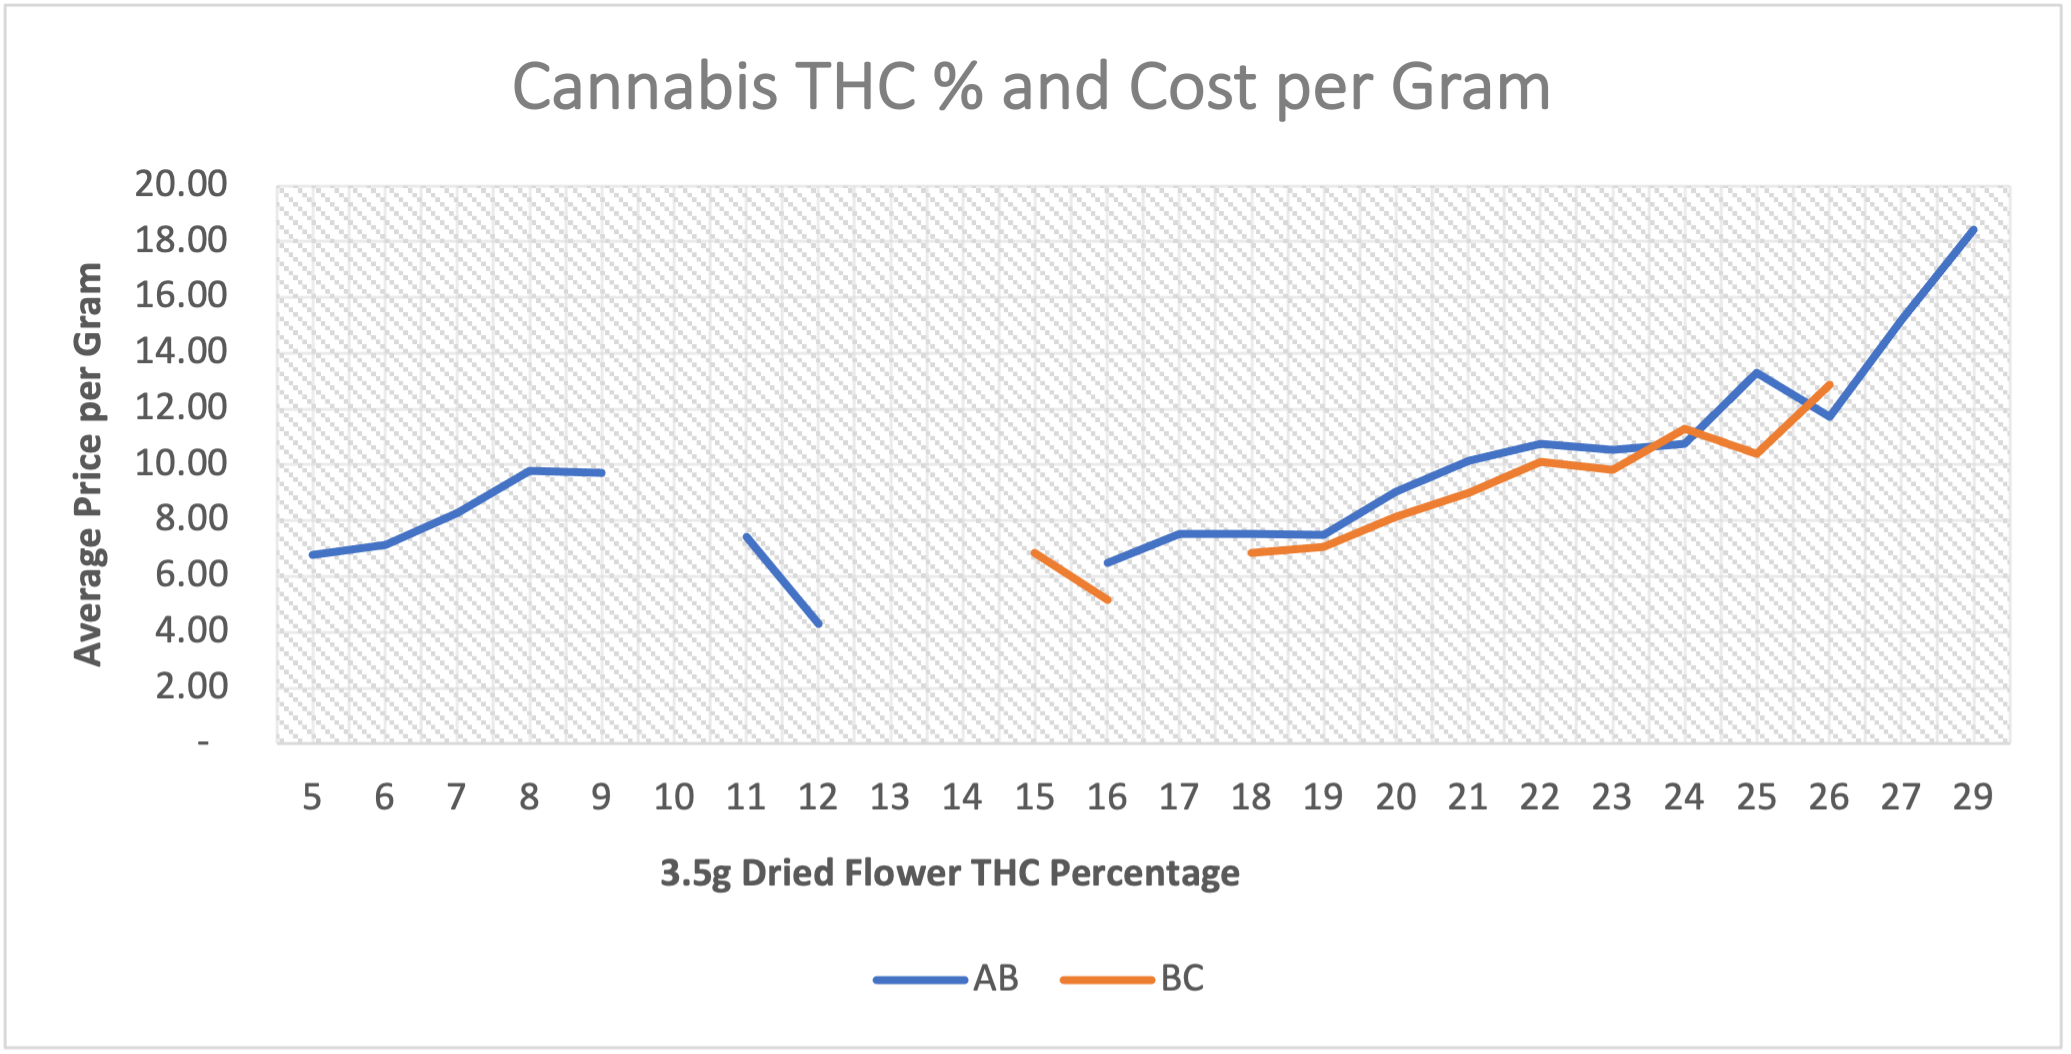 cannabis THC% cost per gram